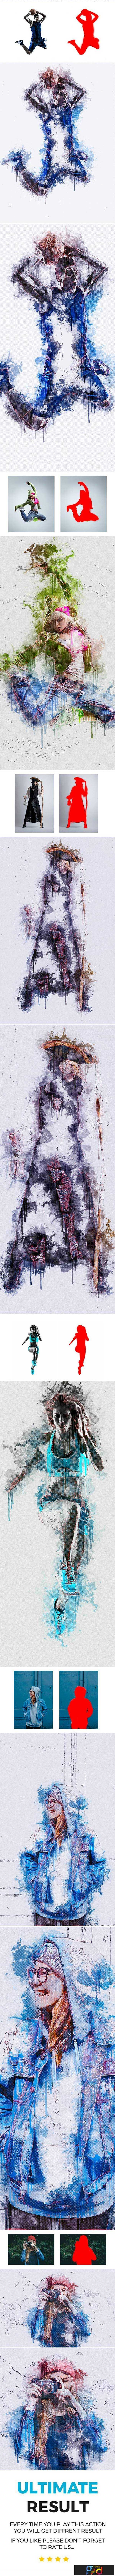 1805231 Grunge Painting Photoshop Action 21724719 2